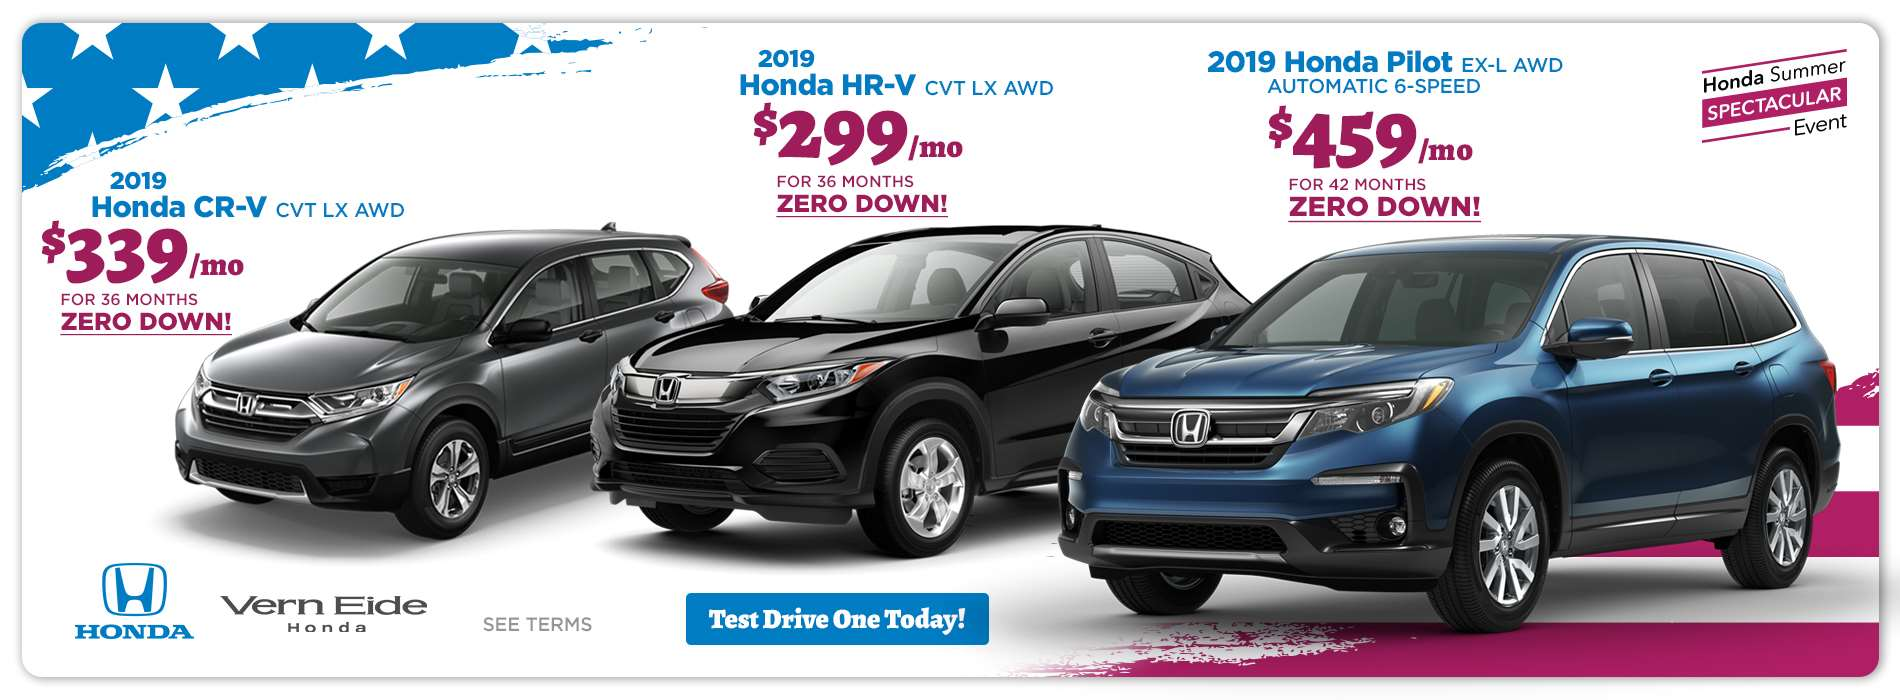 Honda - SUV - July 2019